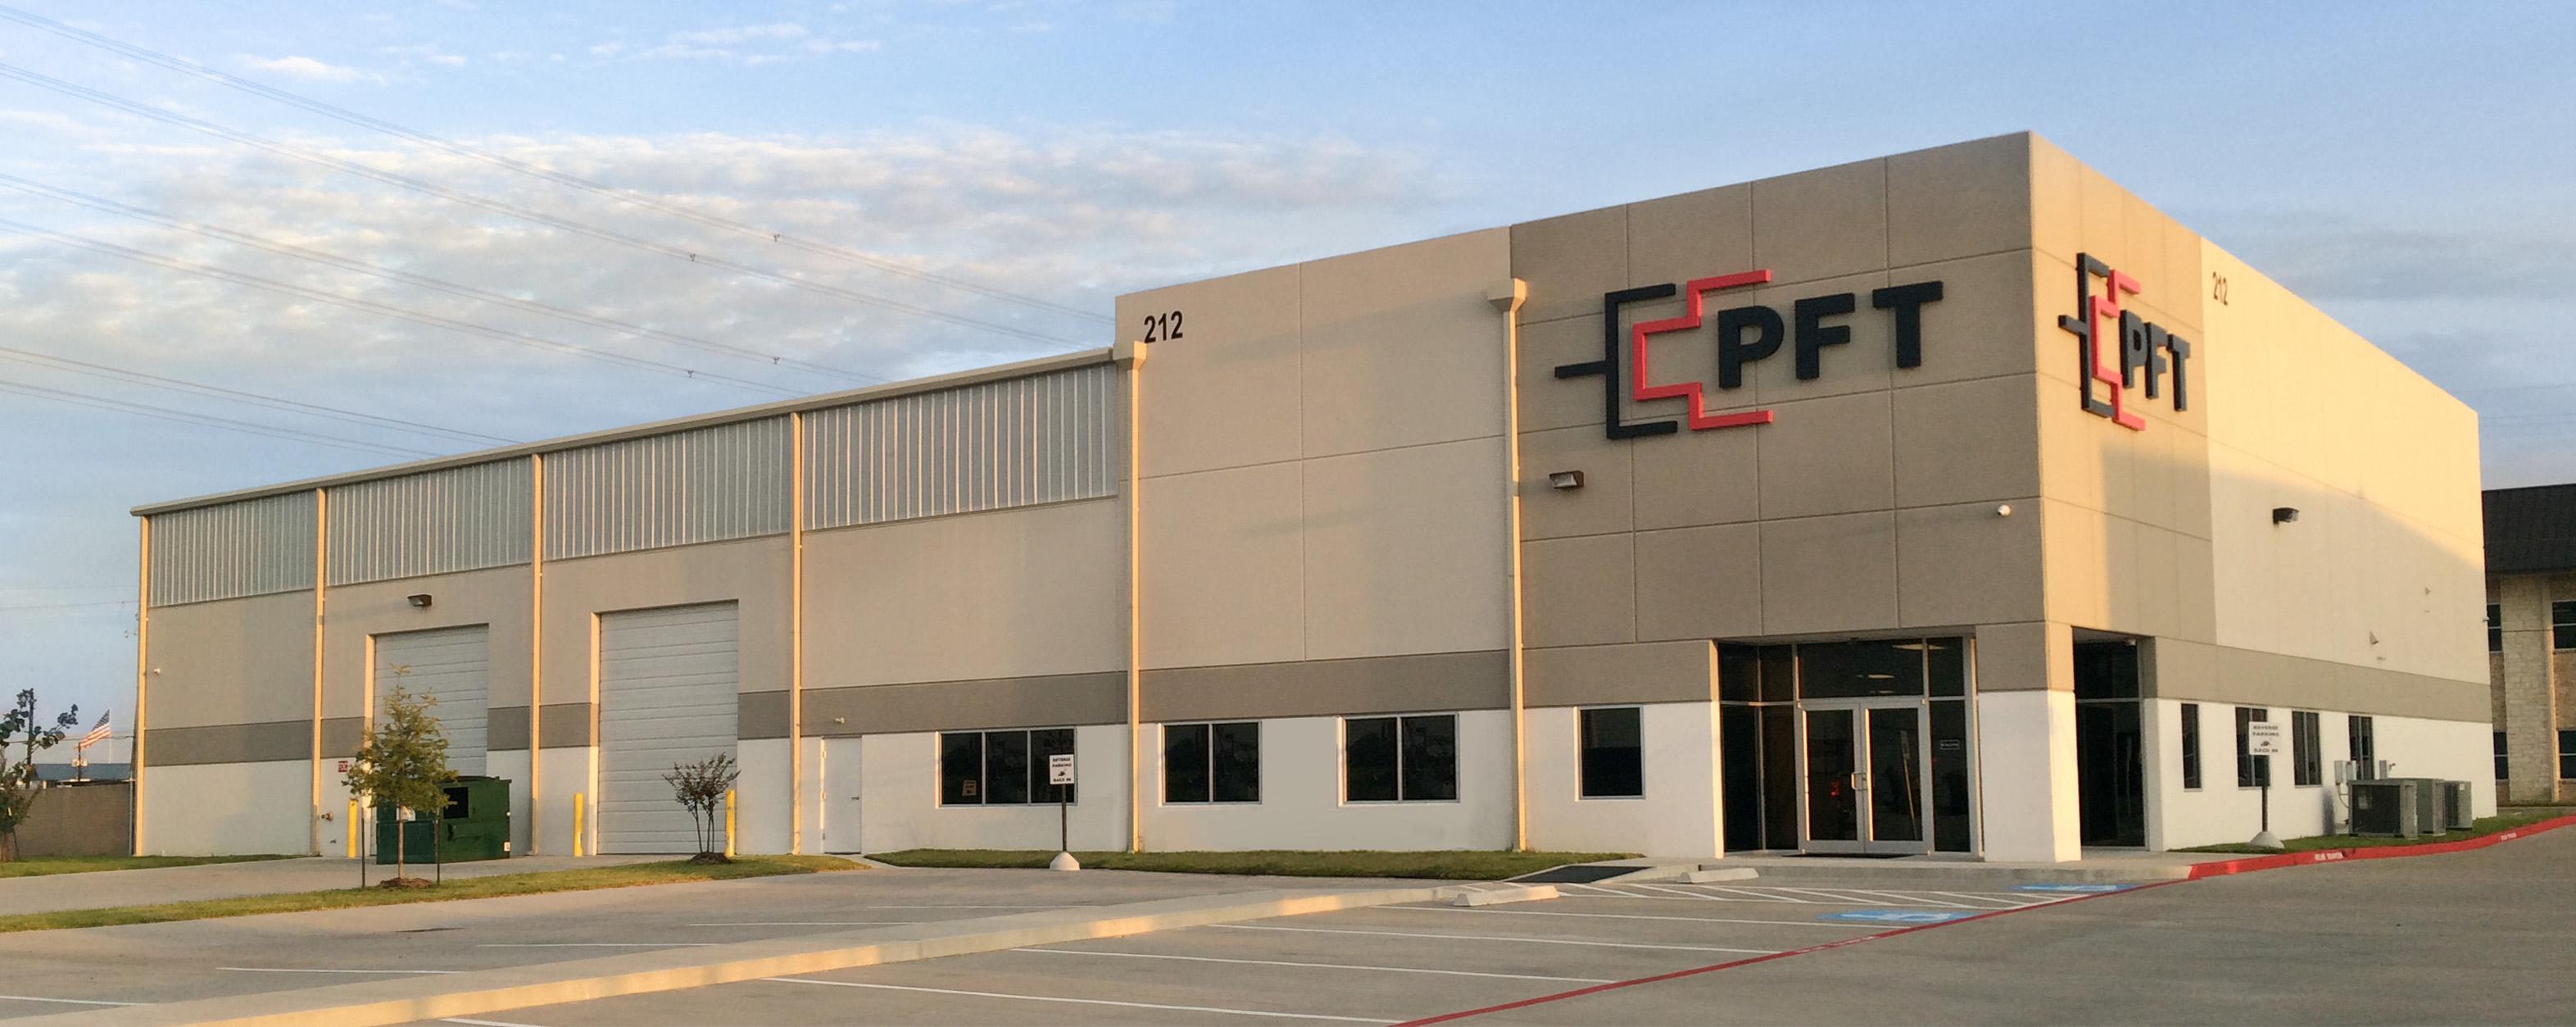 PFT Headquarter Building